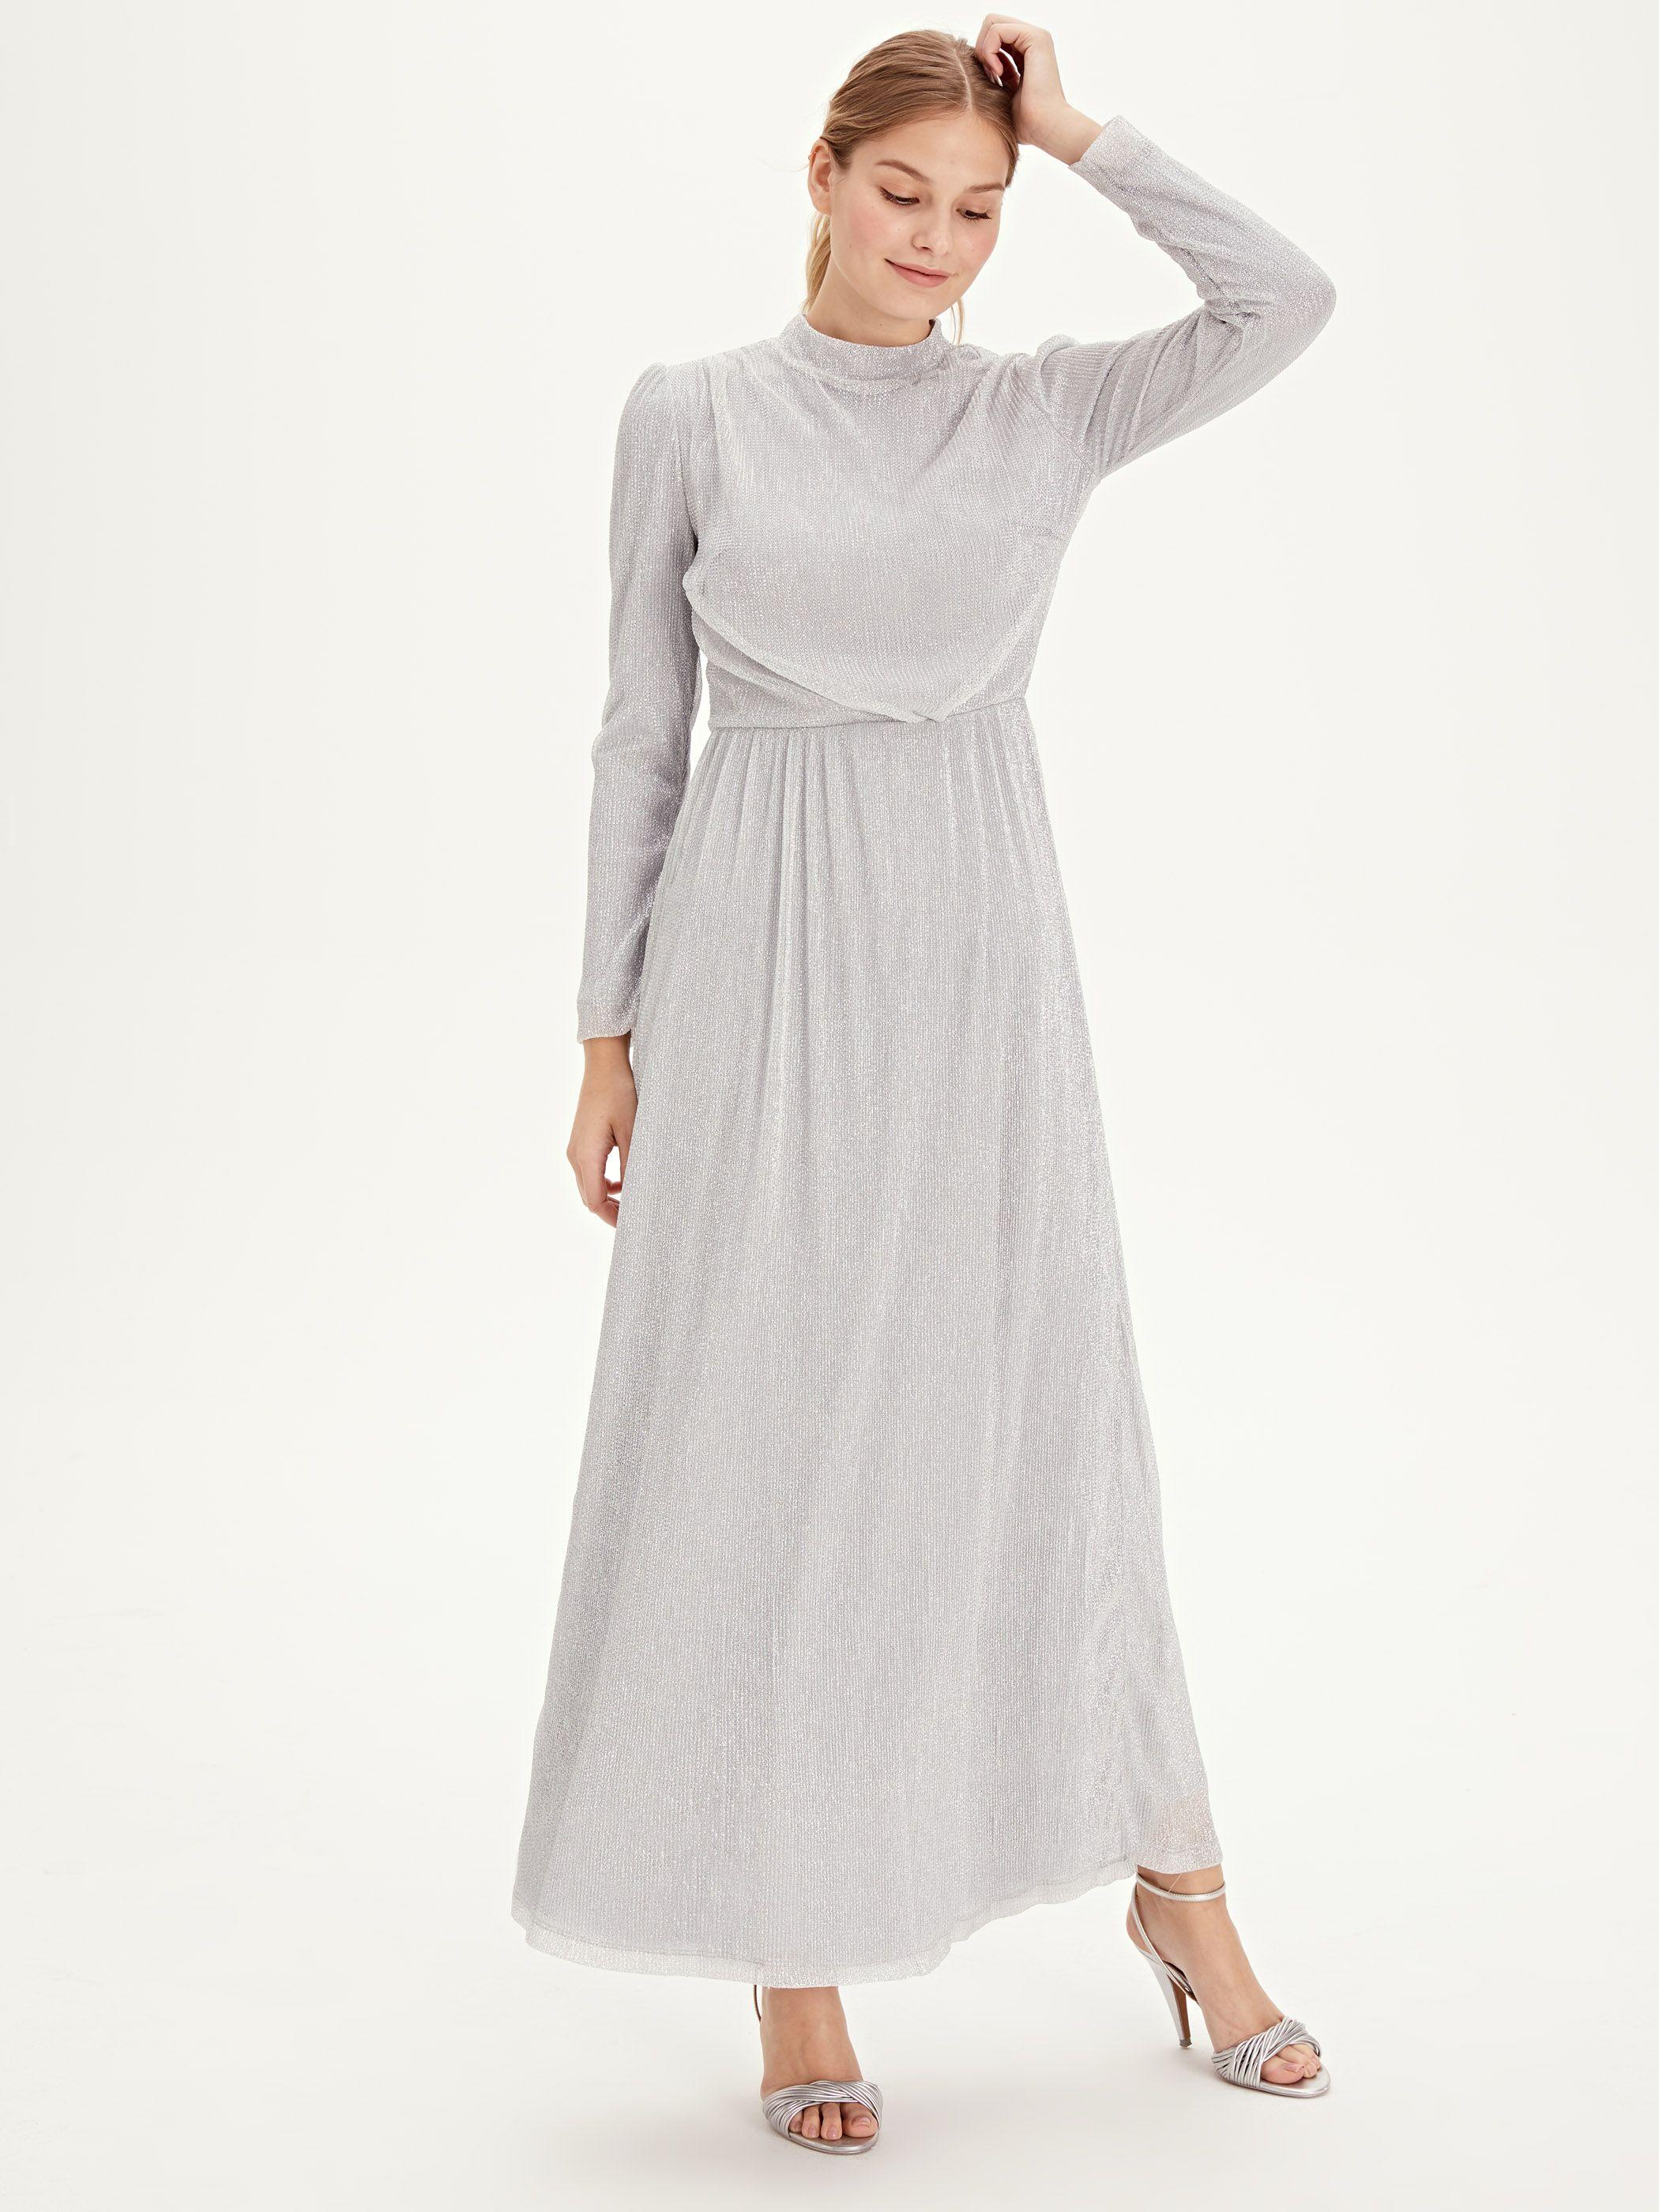 Gri Isiltili Uzun Sifon Abiye Elbise Lc Waikiki 2020 Elbise The Dress Elbiseler